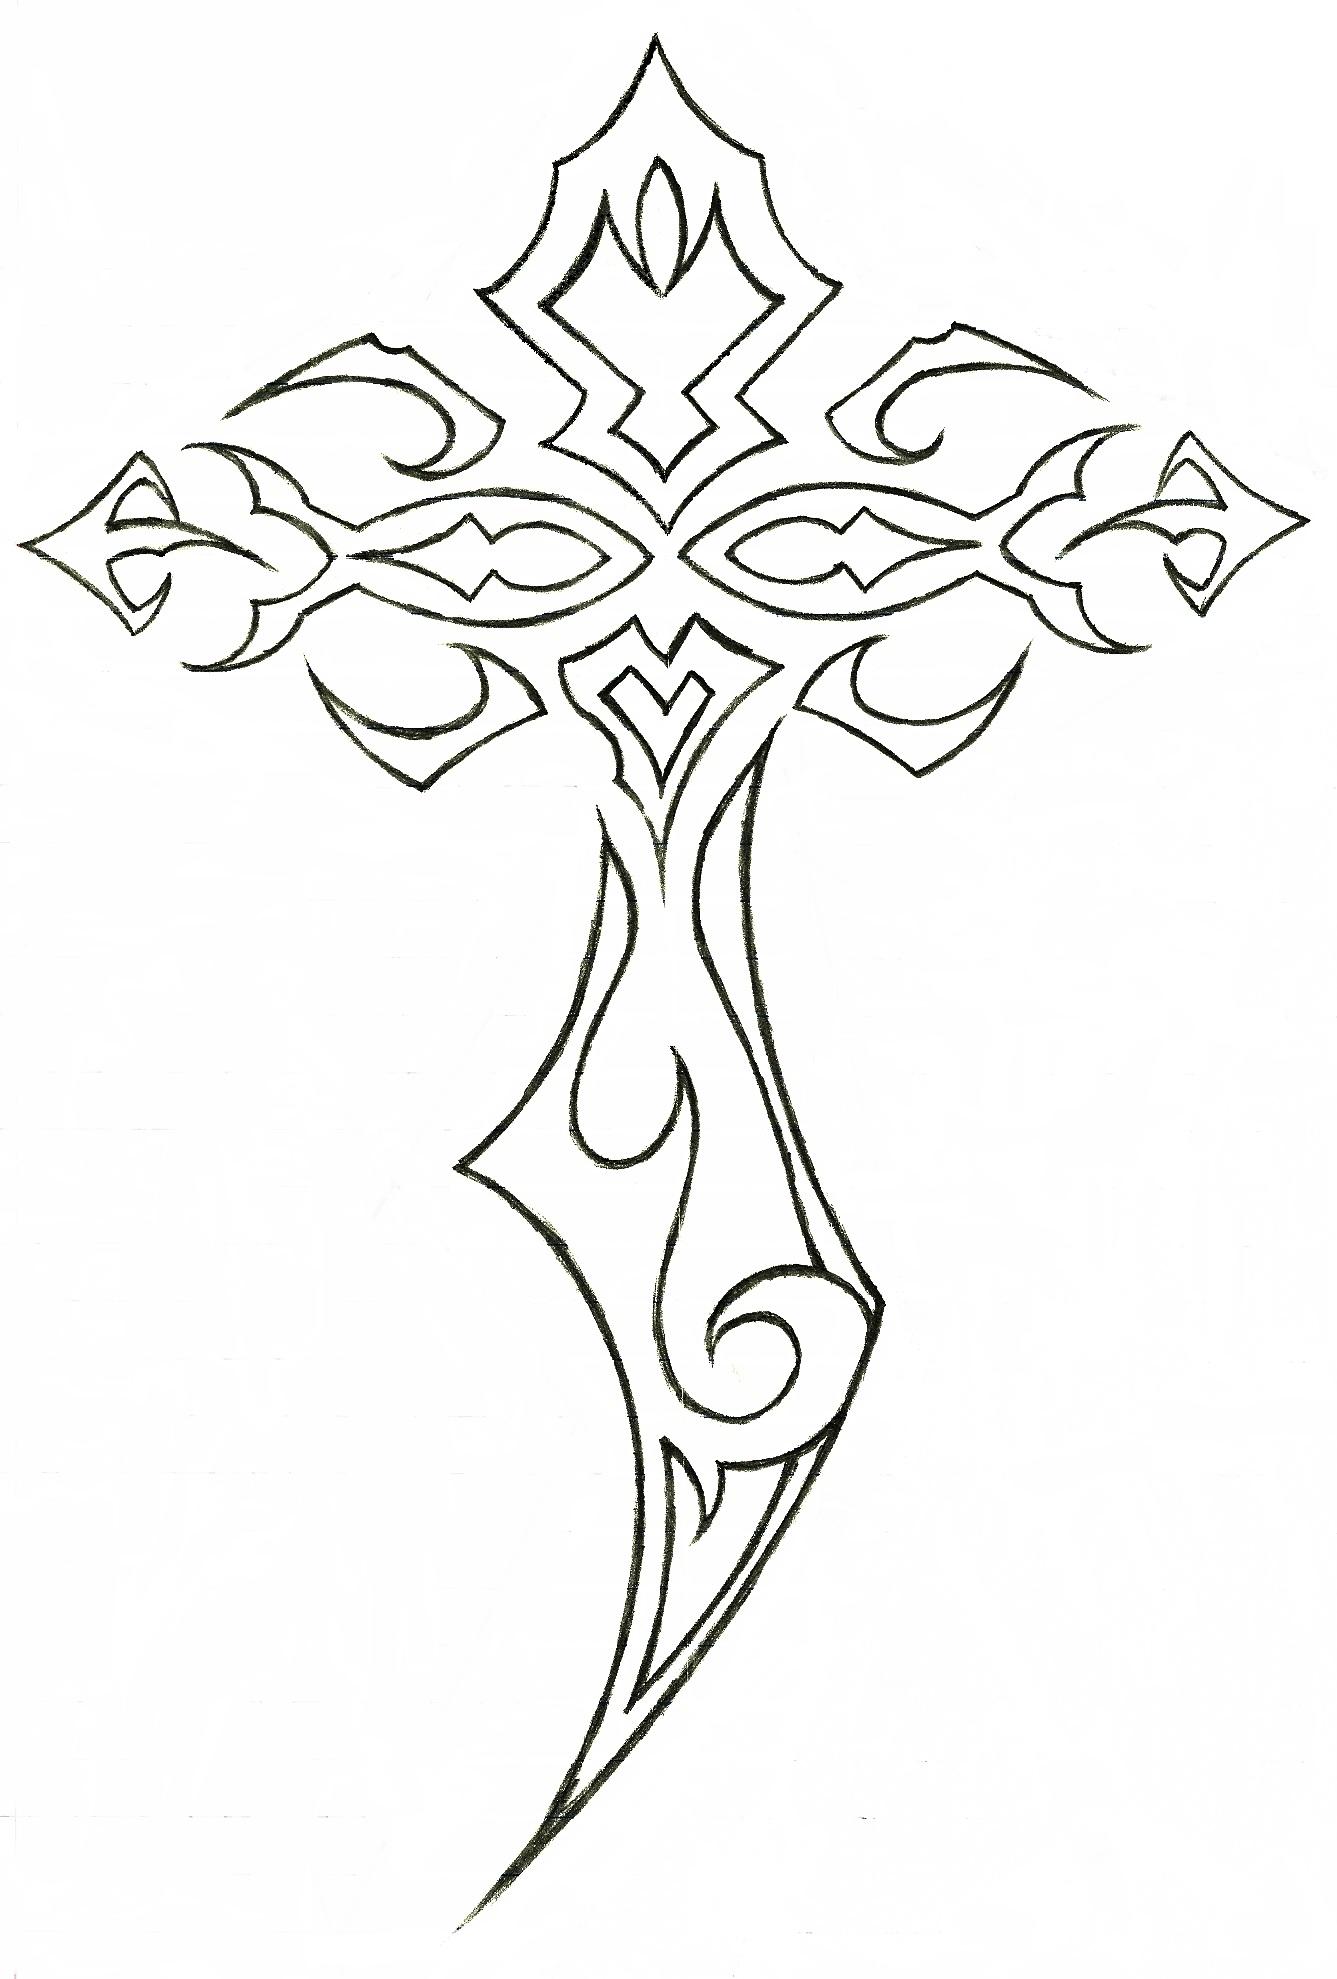 1337x1979 Tribal Cross Tattoos 20 Tribal Cross Tattoos For Men